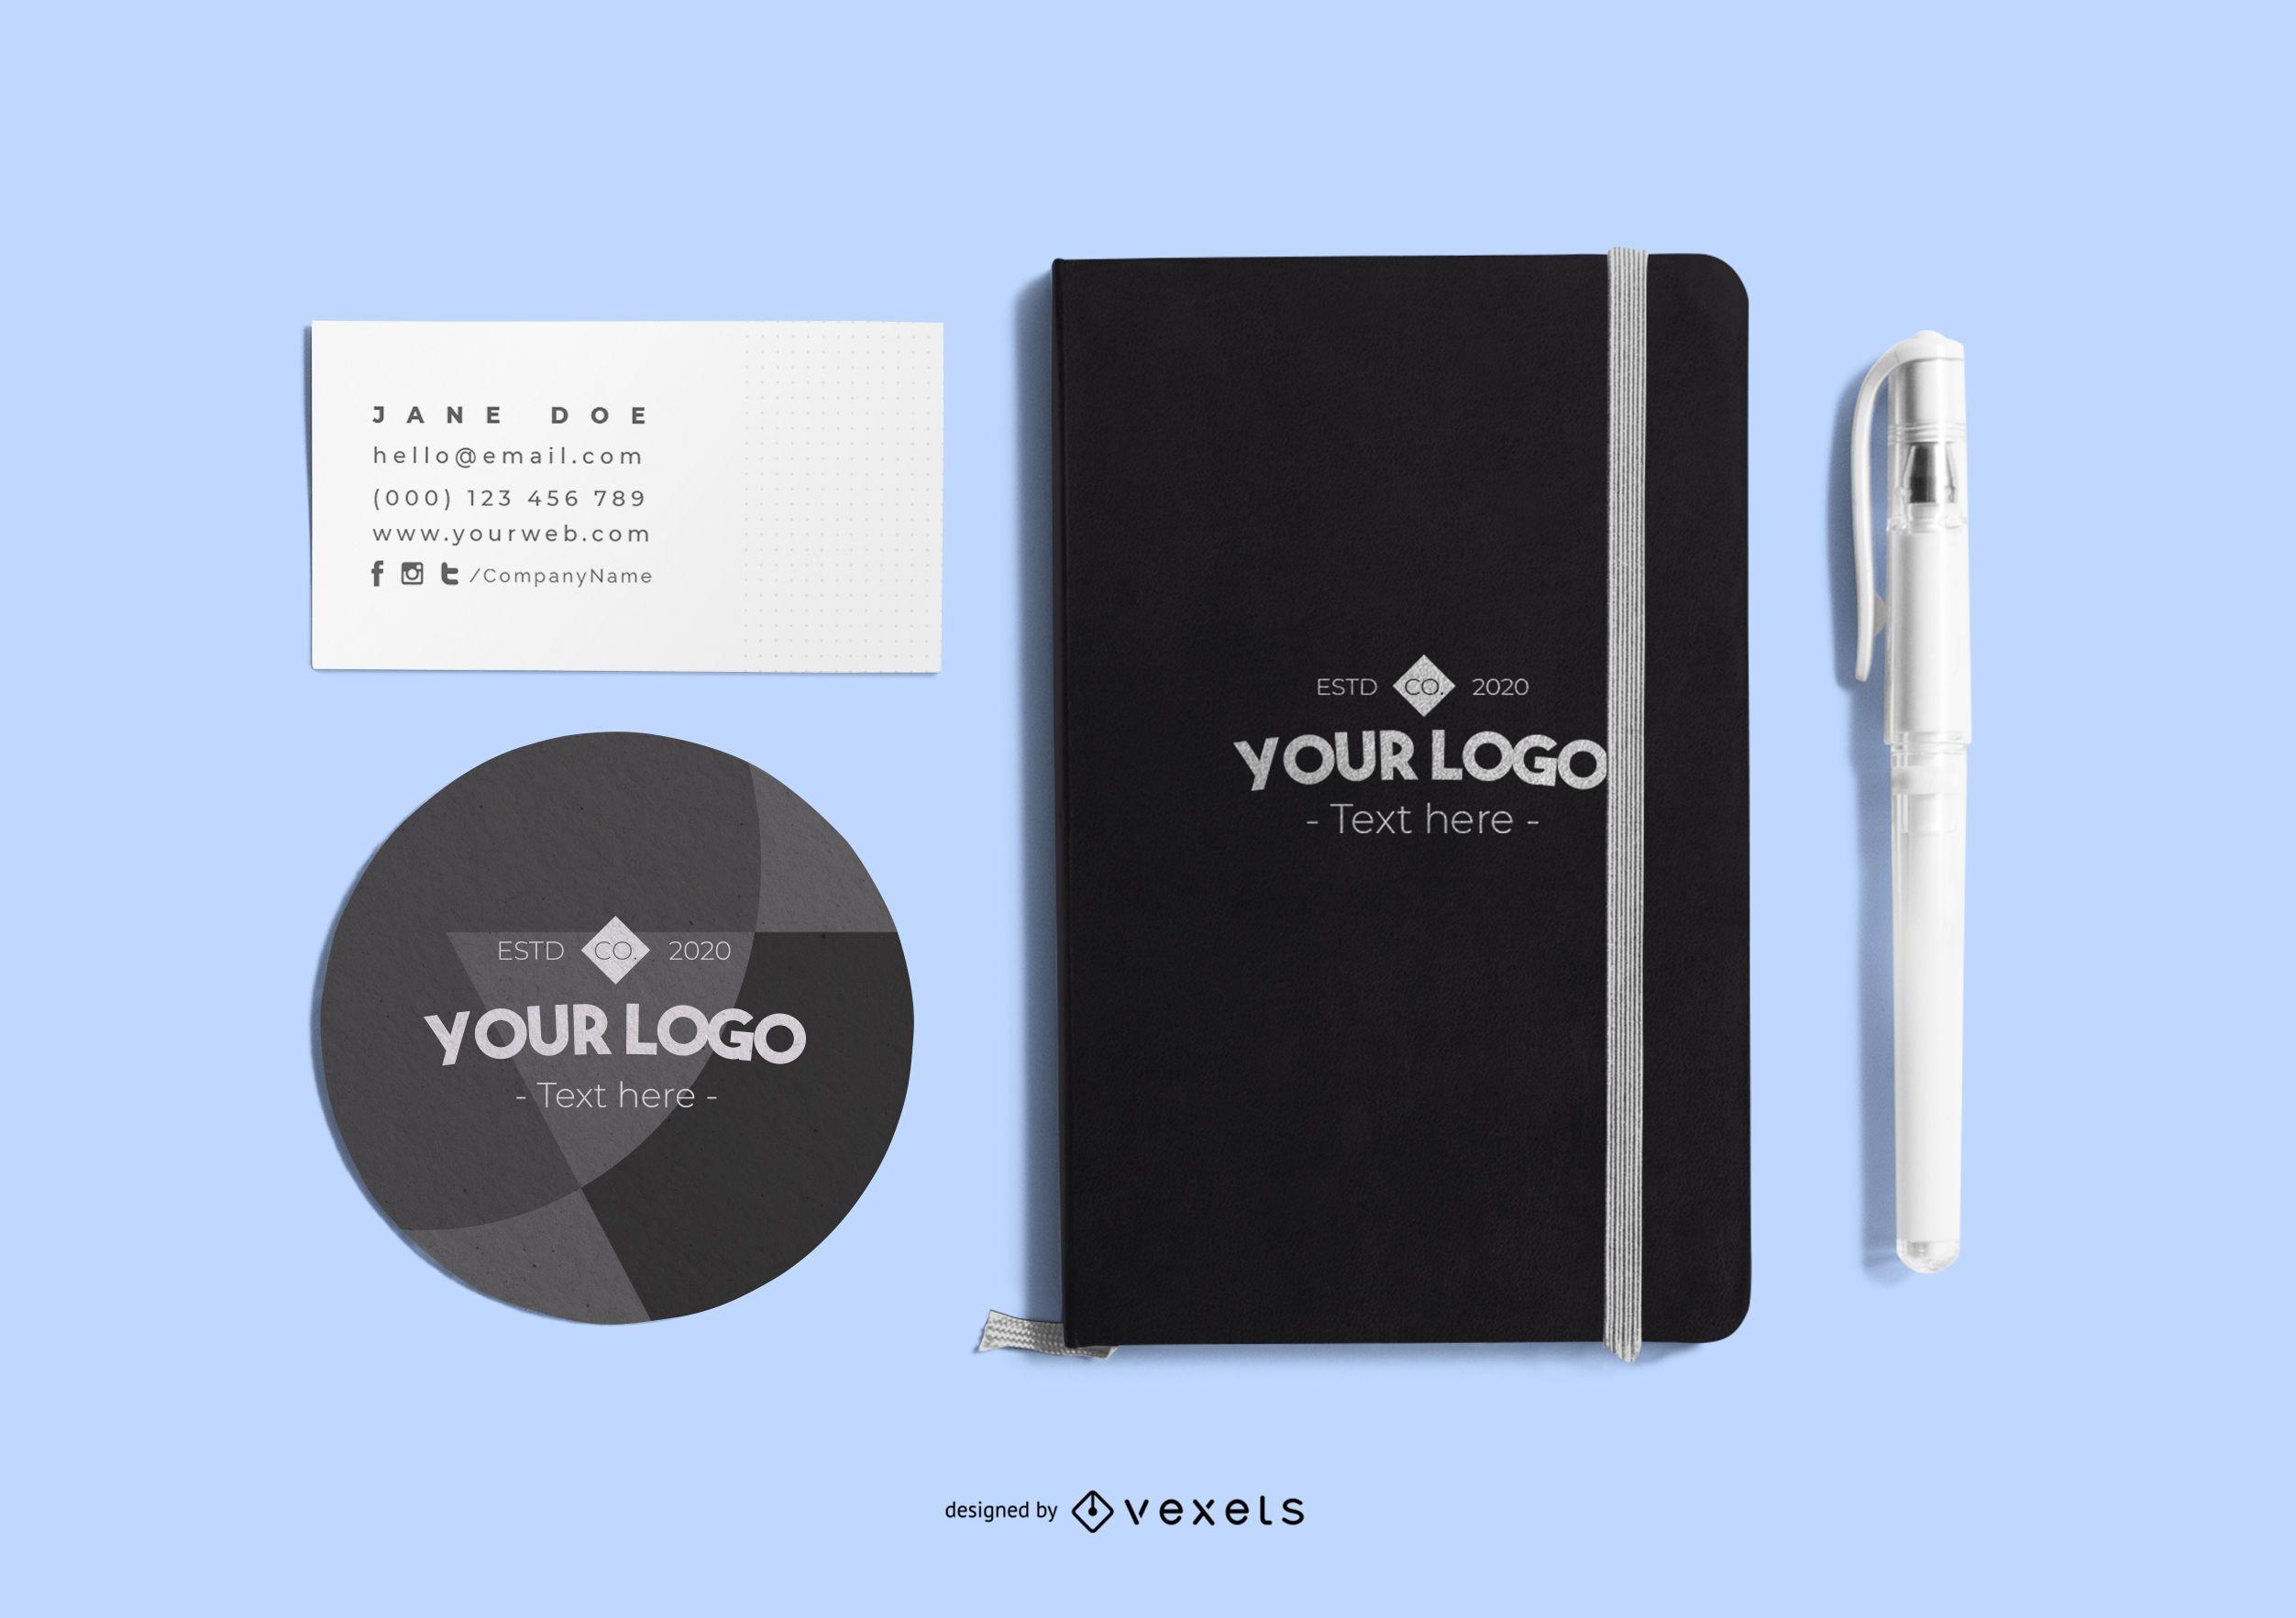 Branding stationery mockup composition